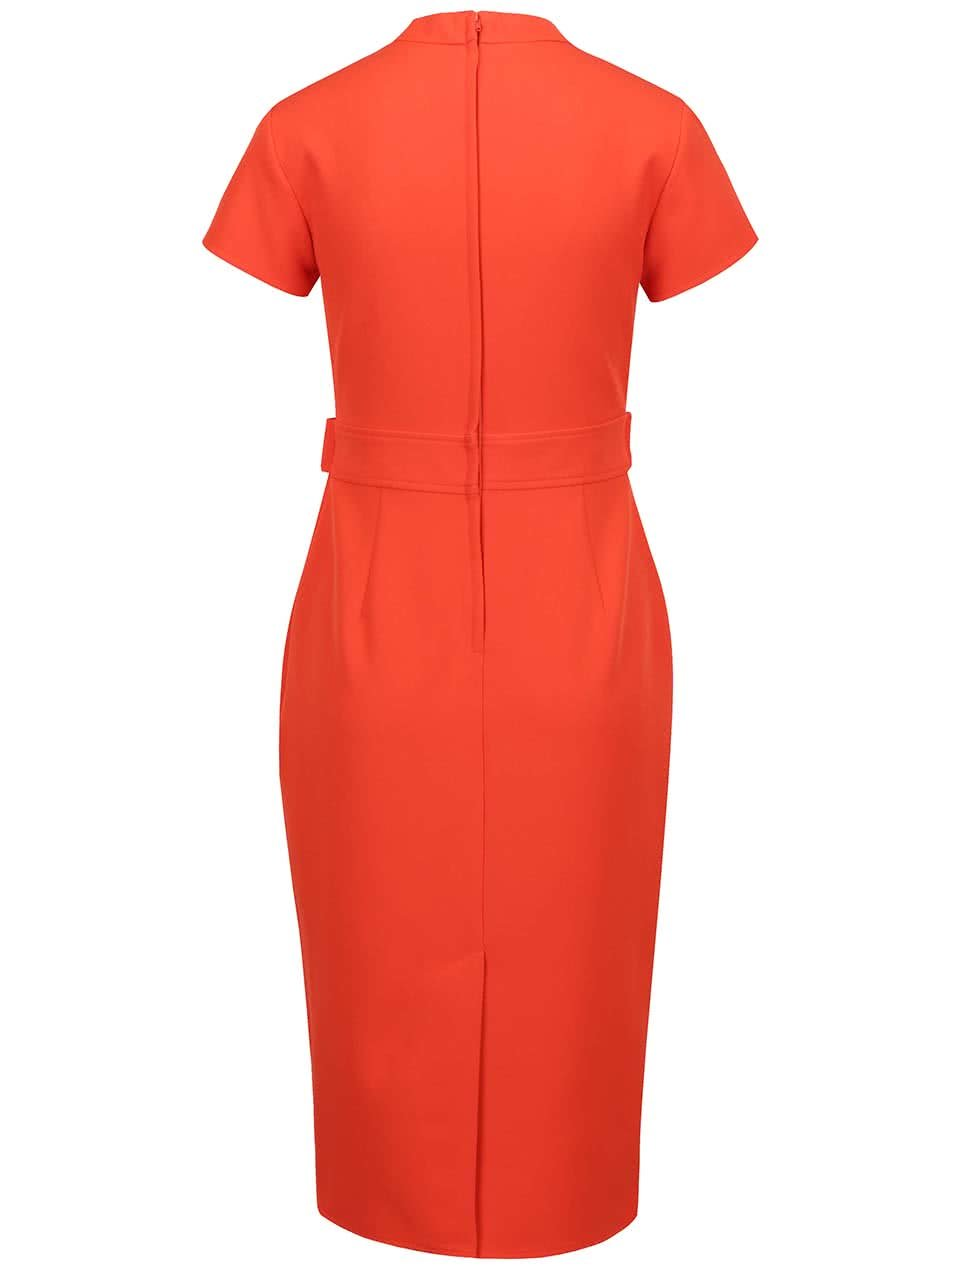 2890fc41ac64 Červené šaty s ozdobným zipsom Dorothy Perkins ...